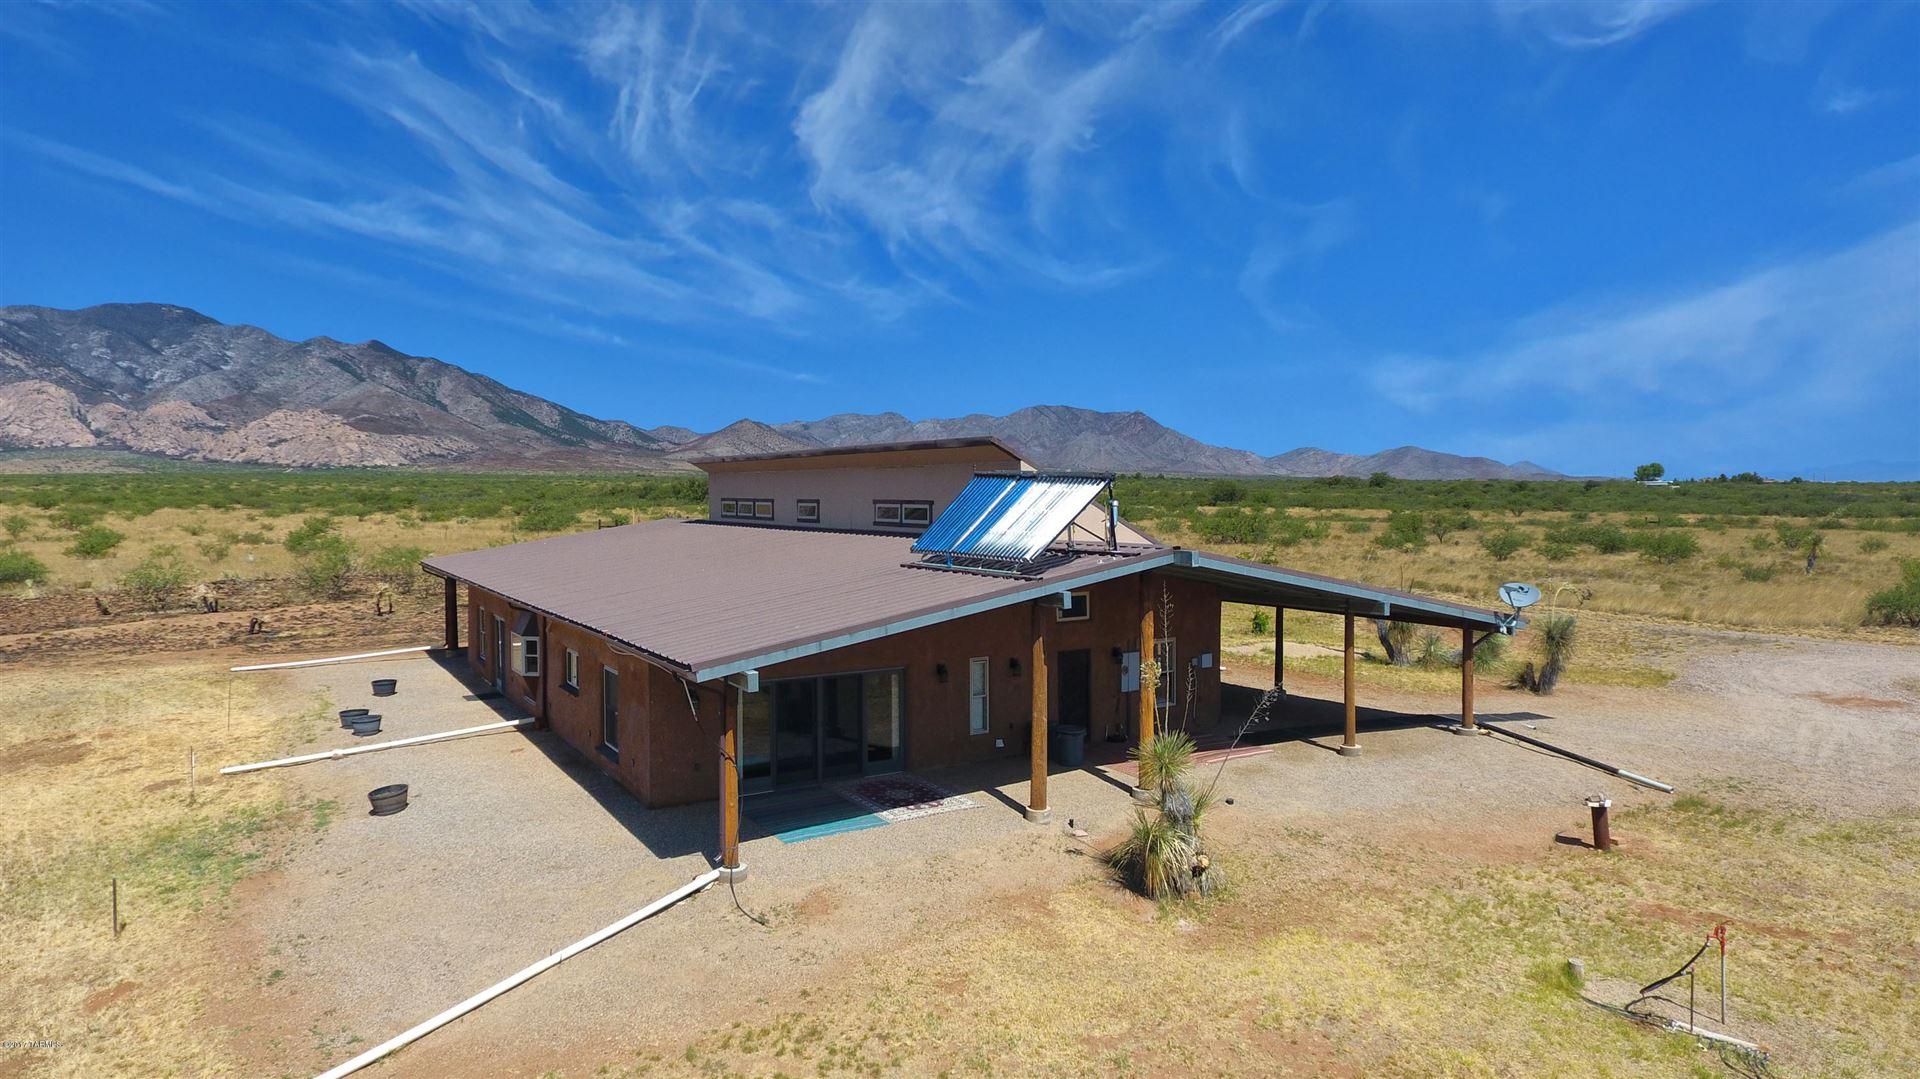 731 N Cochise Stronghold Road, Cochise, AZ 85606 - MLS#: 22000885